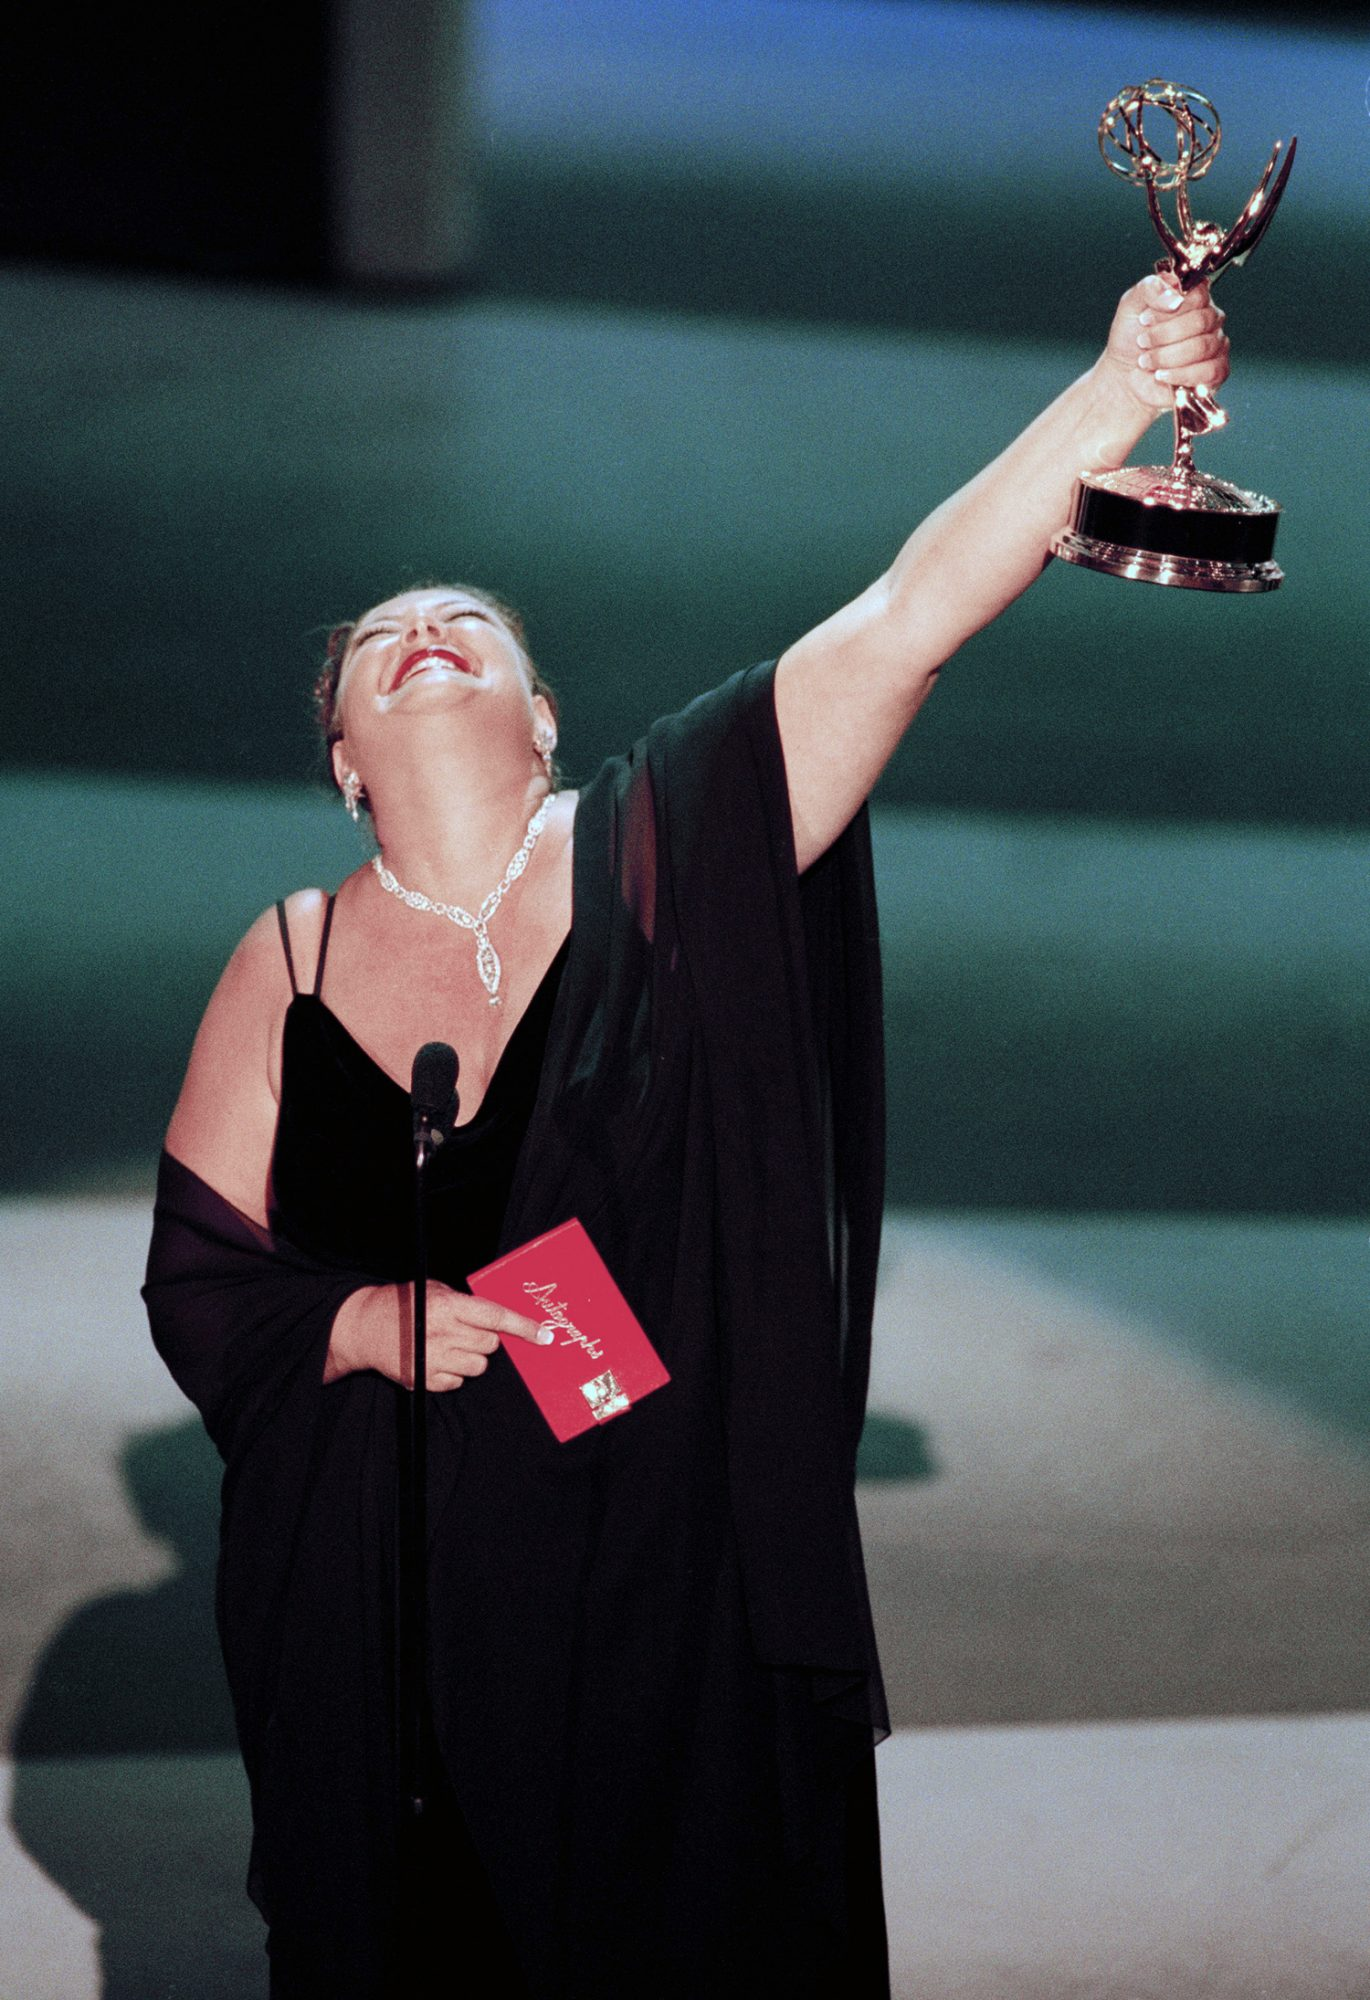 Camryn Manheim during the 50th Annual Primetime Emmy Awards